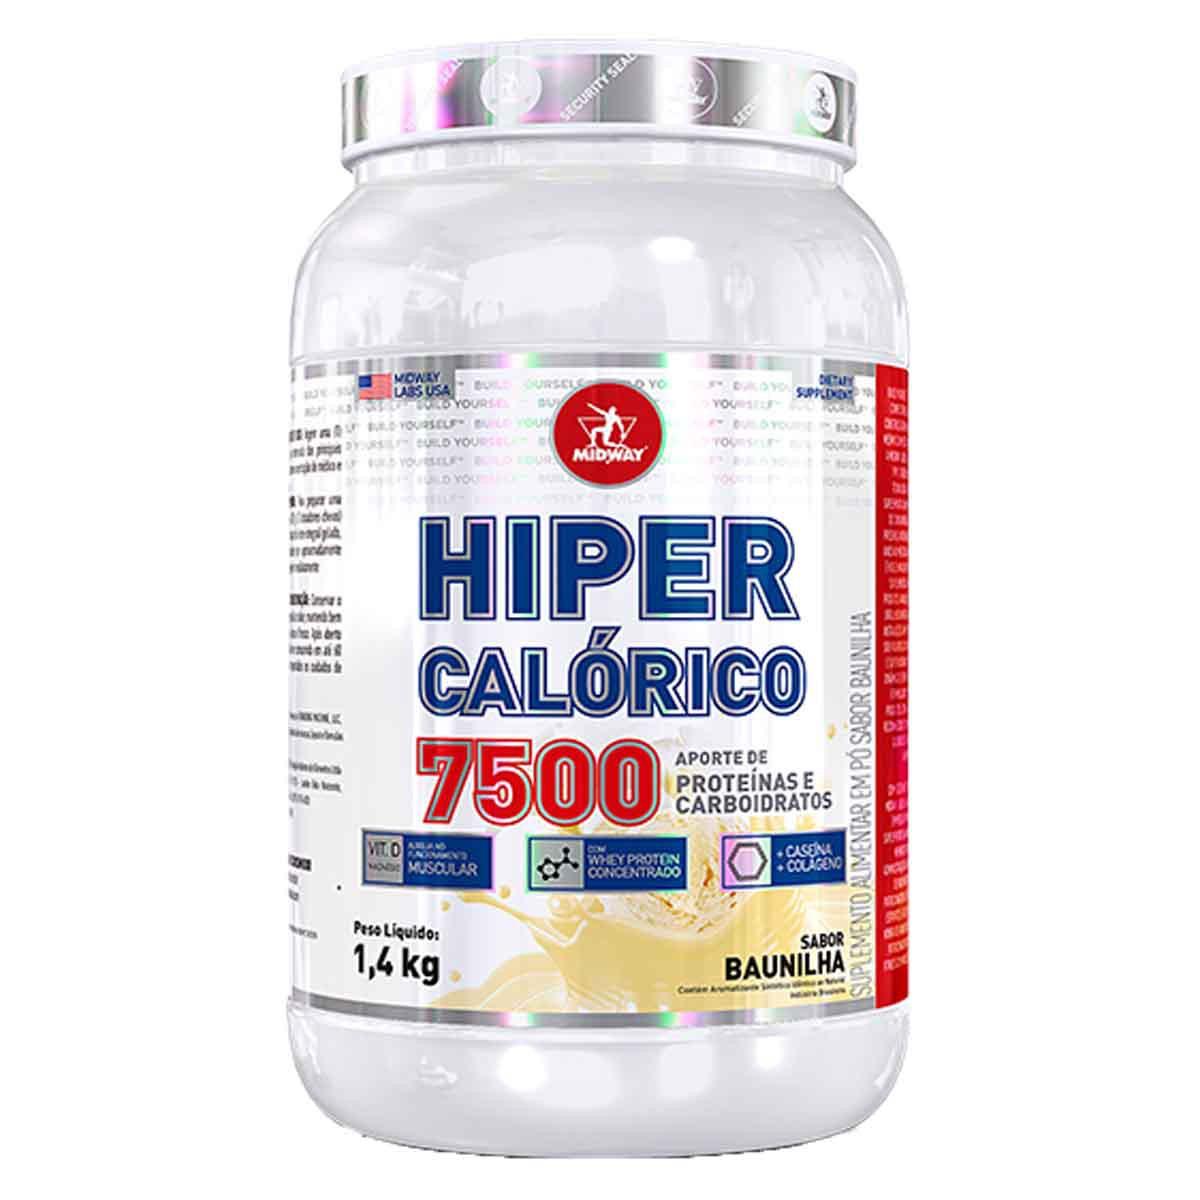 Hipercalorico 7.500 1,5kg - Midway